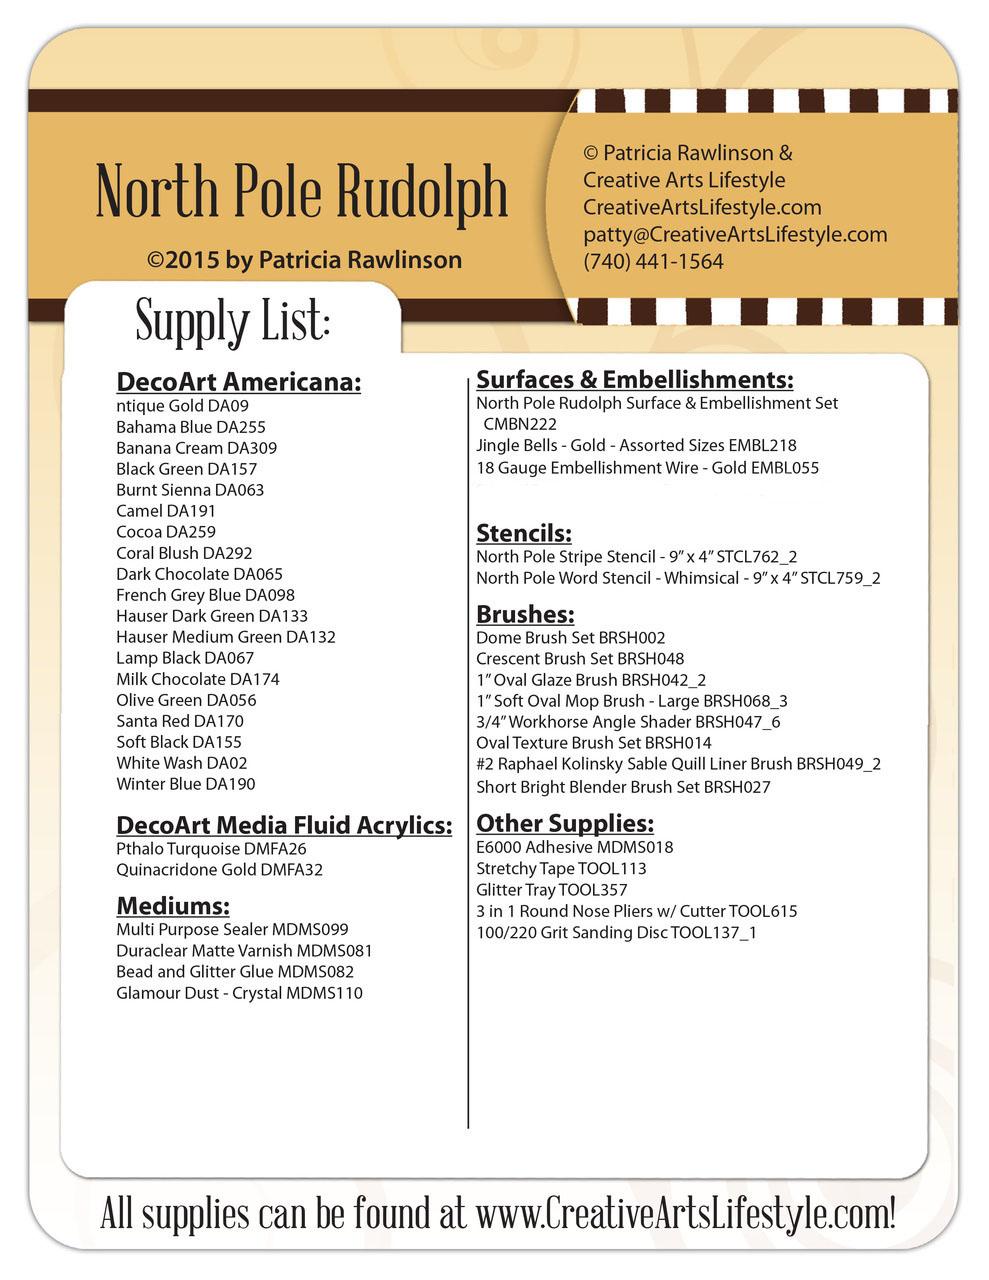 North Pole Rudolph DVD - Patricia Rawlinson